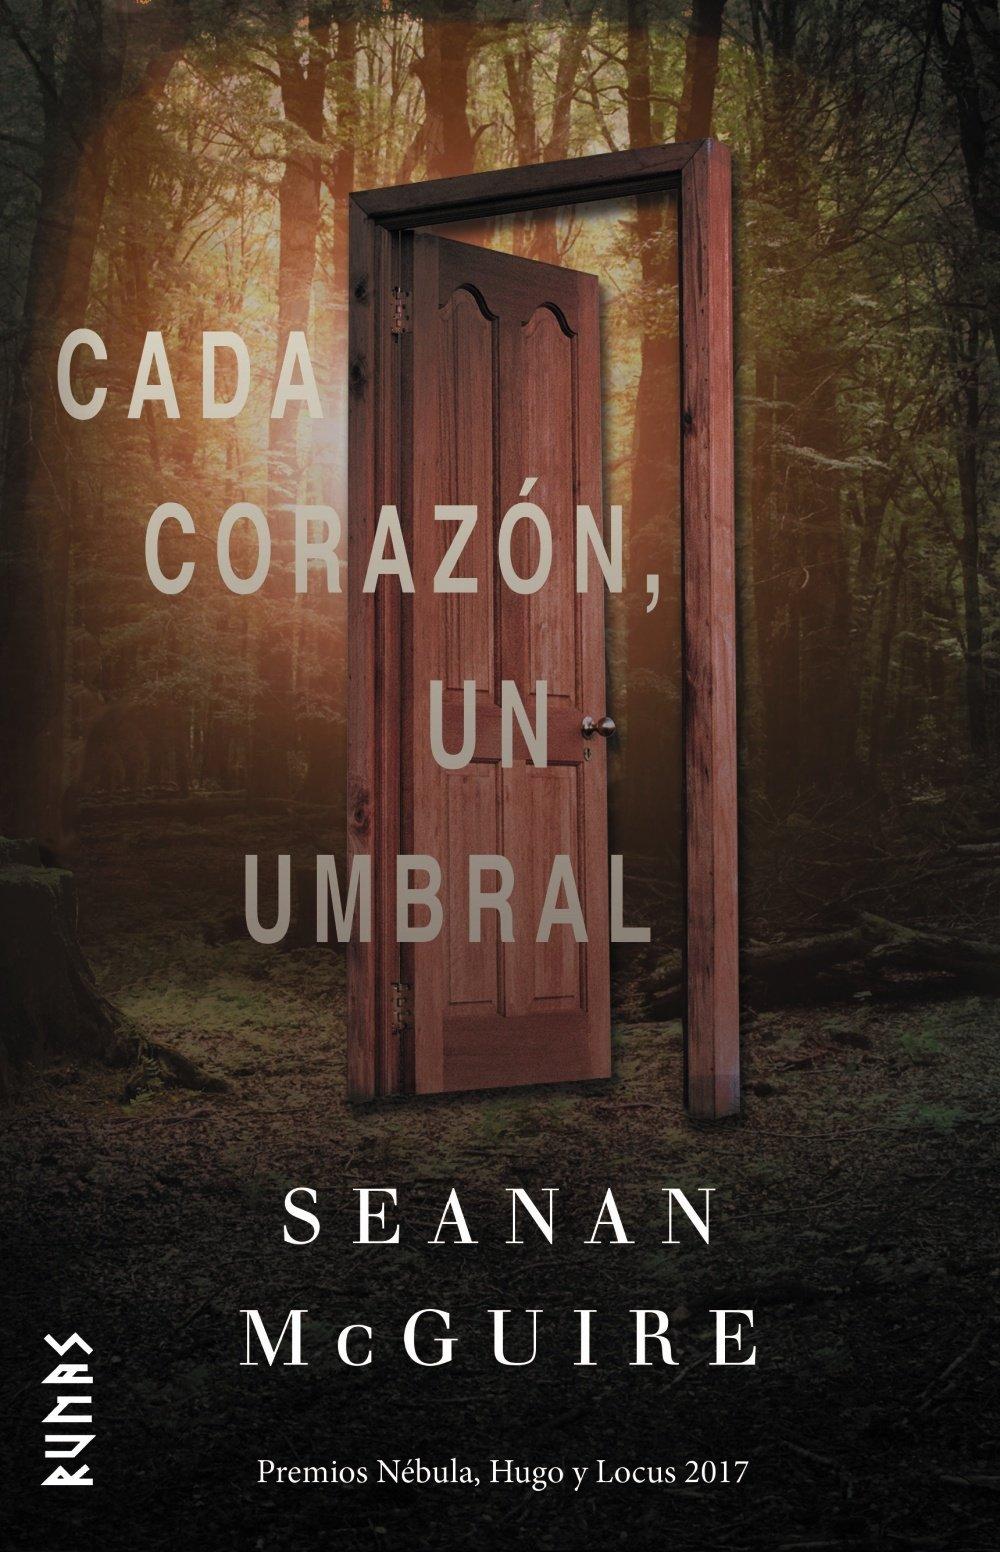 Cada corazón, un umbral (Runas) Tapa dura – 28 jun 2018 Seanan McGuire María Pilar San Román Alianza Editorial 8491812008